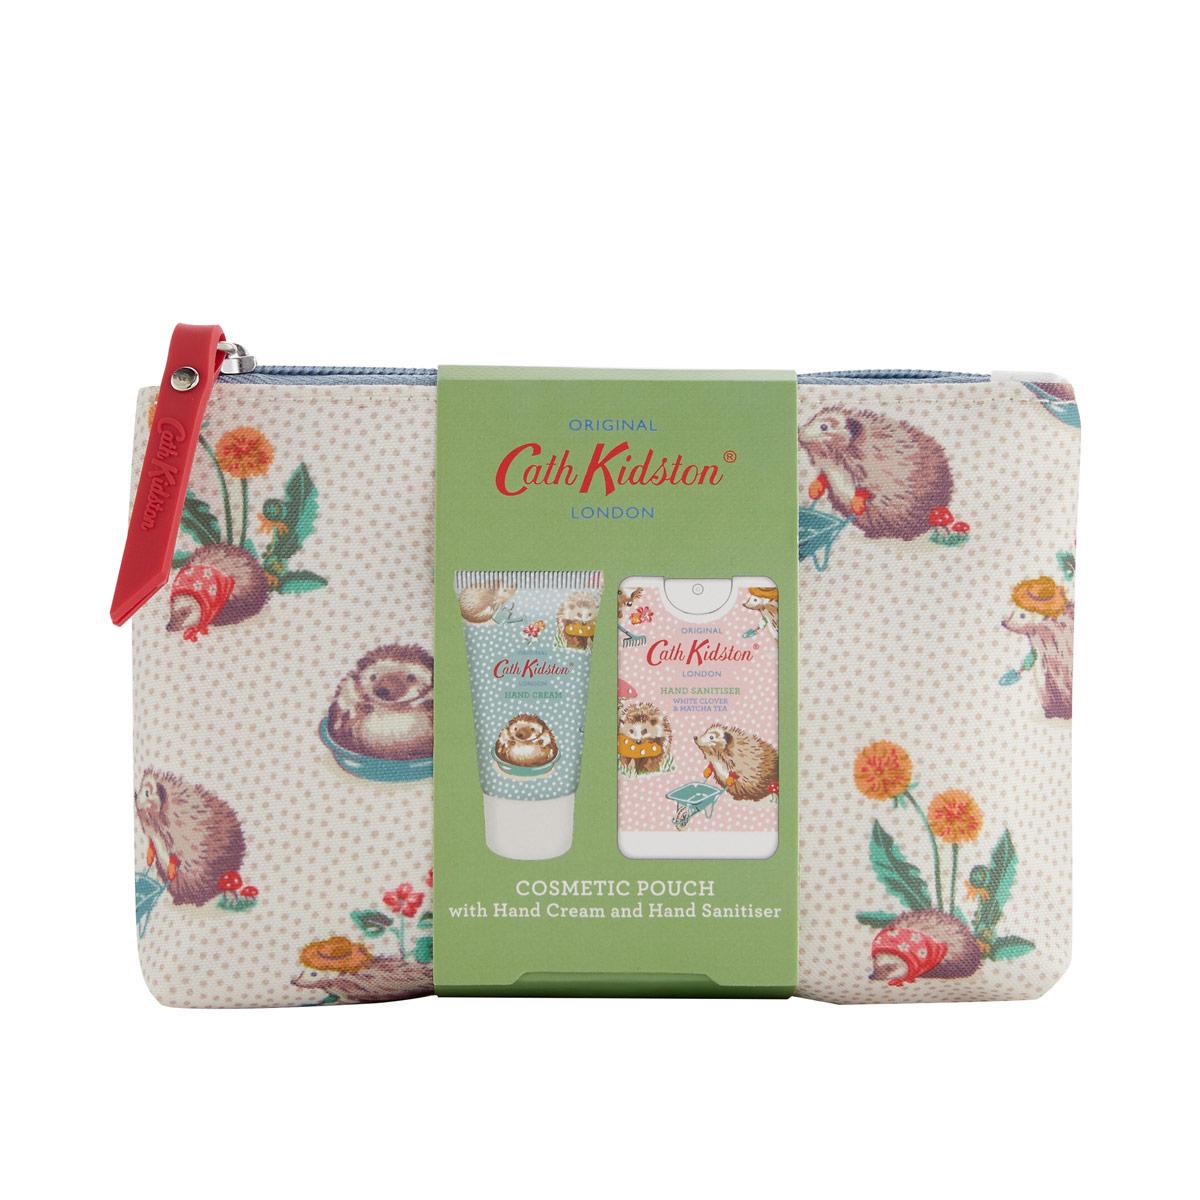 Cath Kidston Gardeners Club Cosmetic Pouch